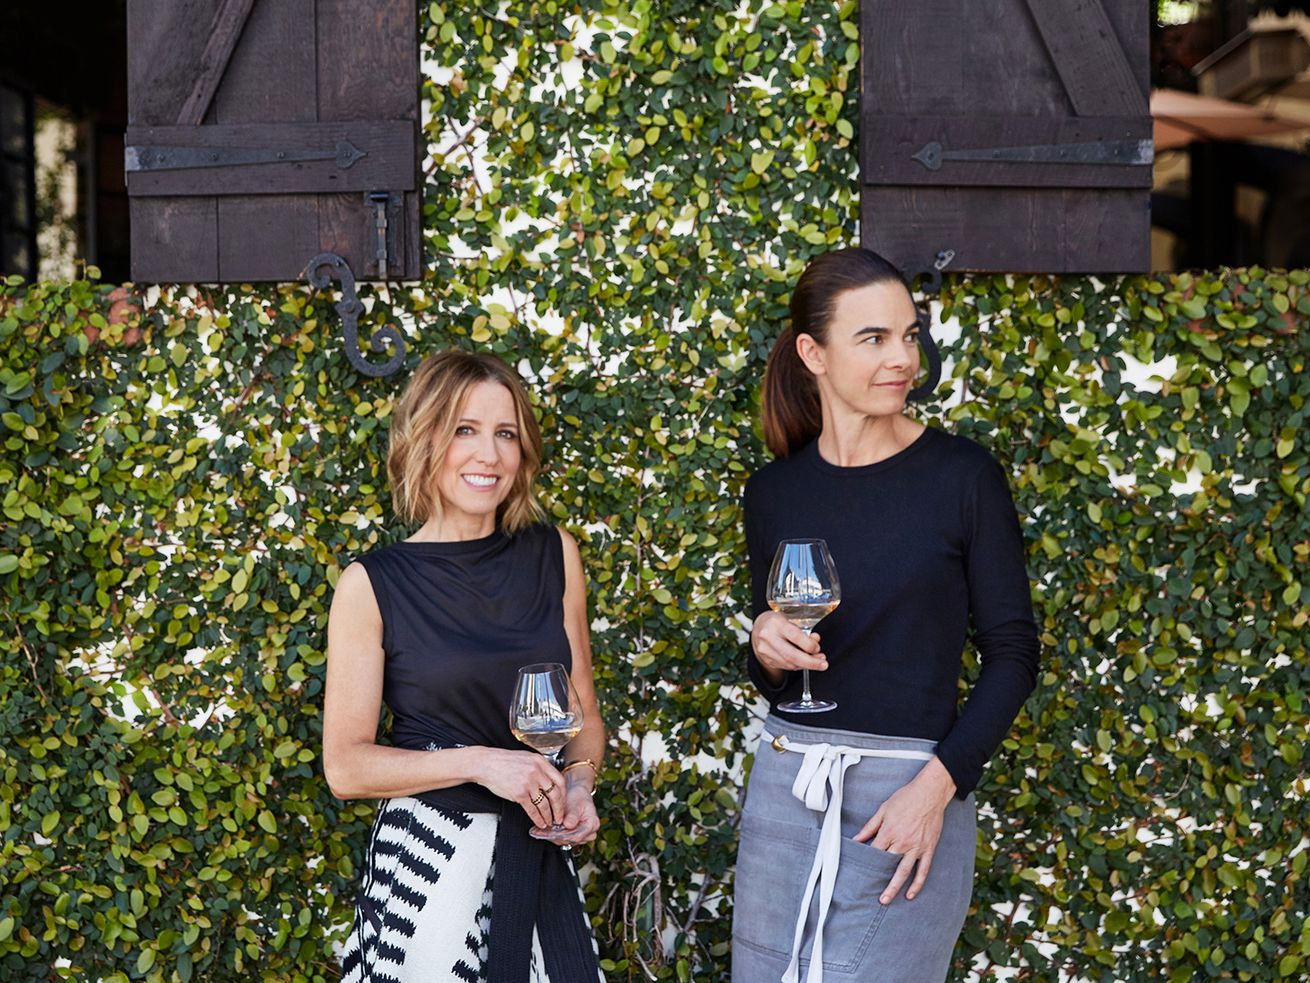 Caroline Styne and Suzanne Goin